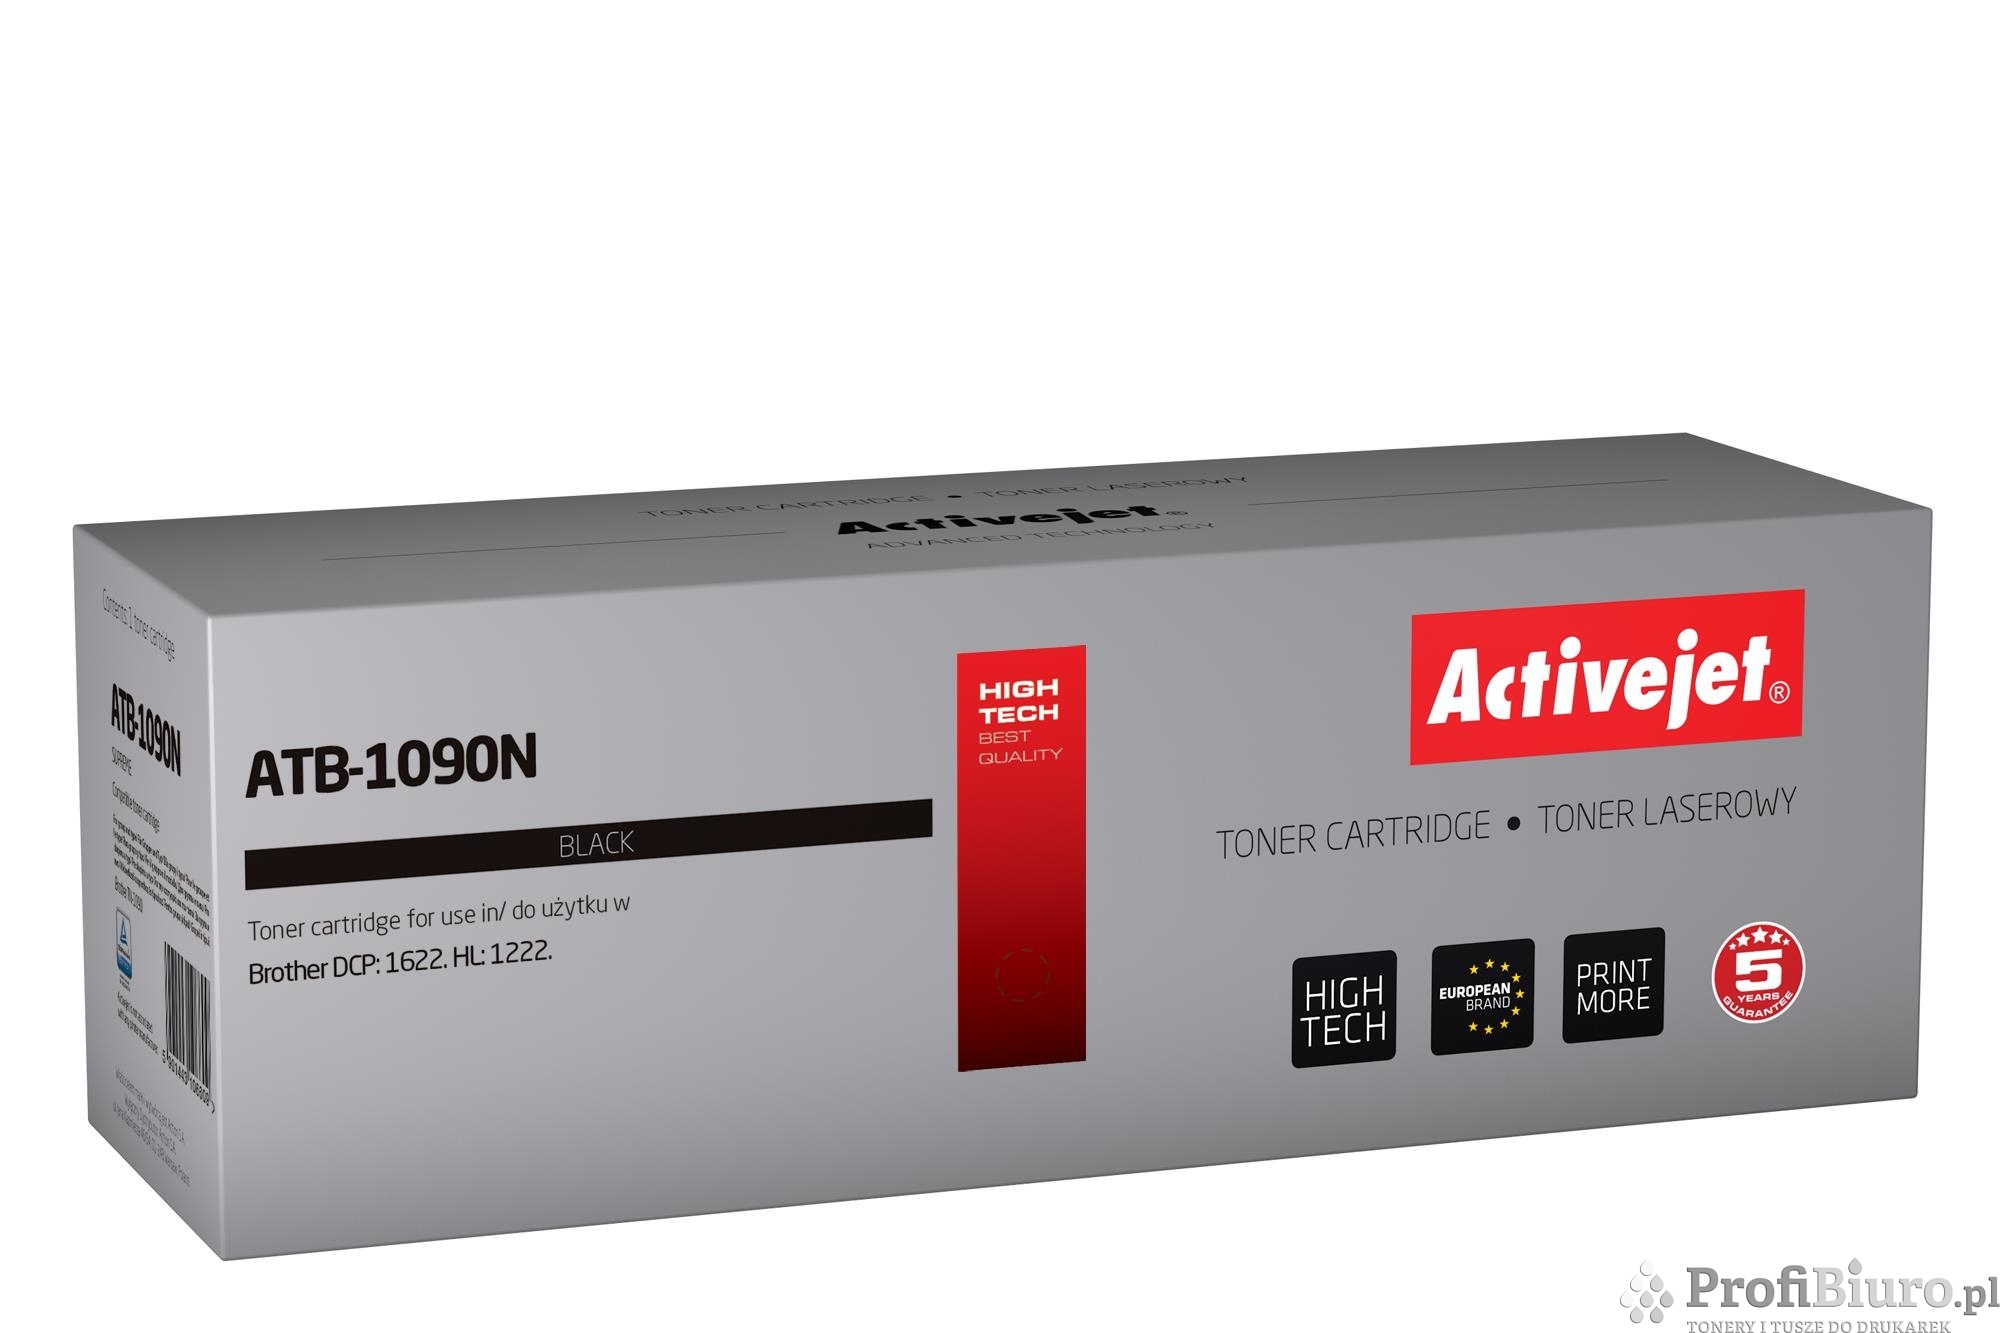 Toner Activejet ATB-1090N (zamiennik Brother TN-1090; Supreme; 1 500 stron; czarny)